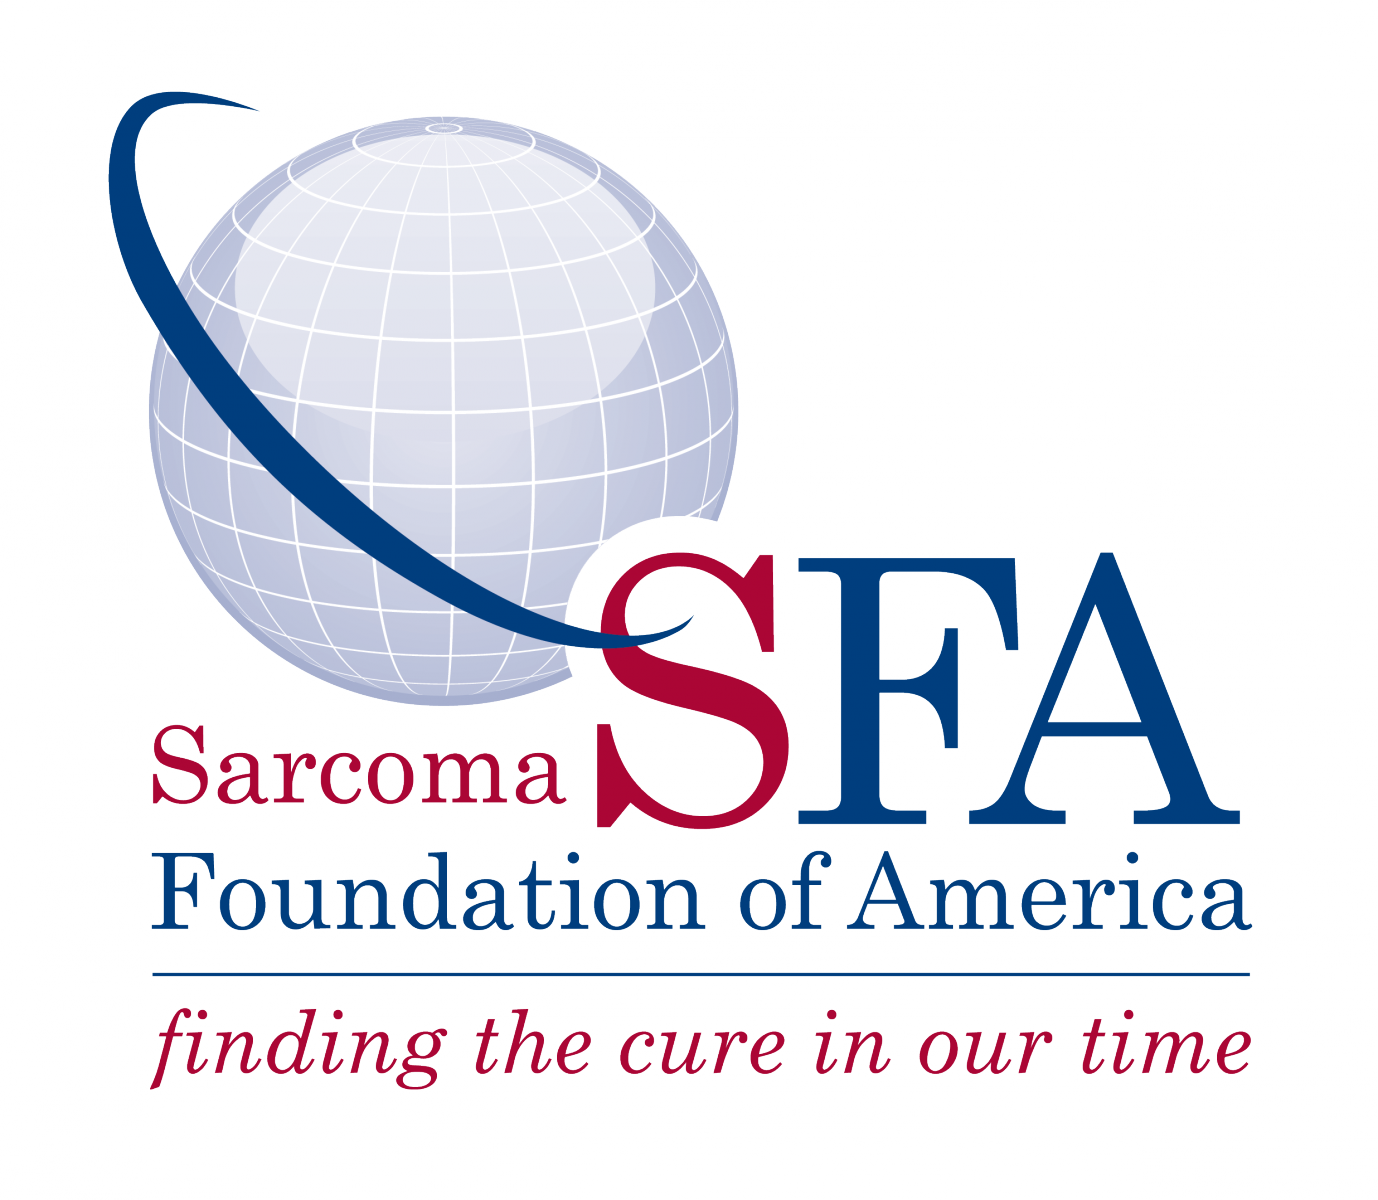 Sarcoma Foundation of America logo